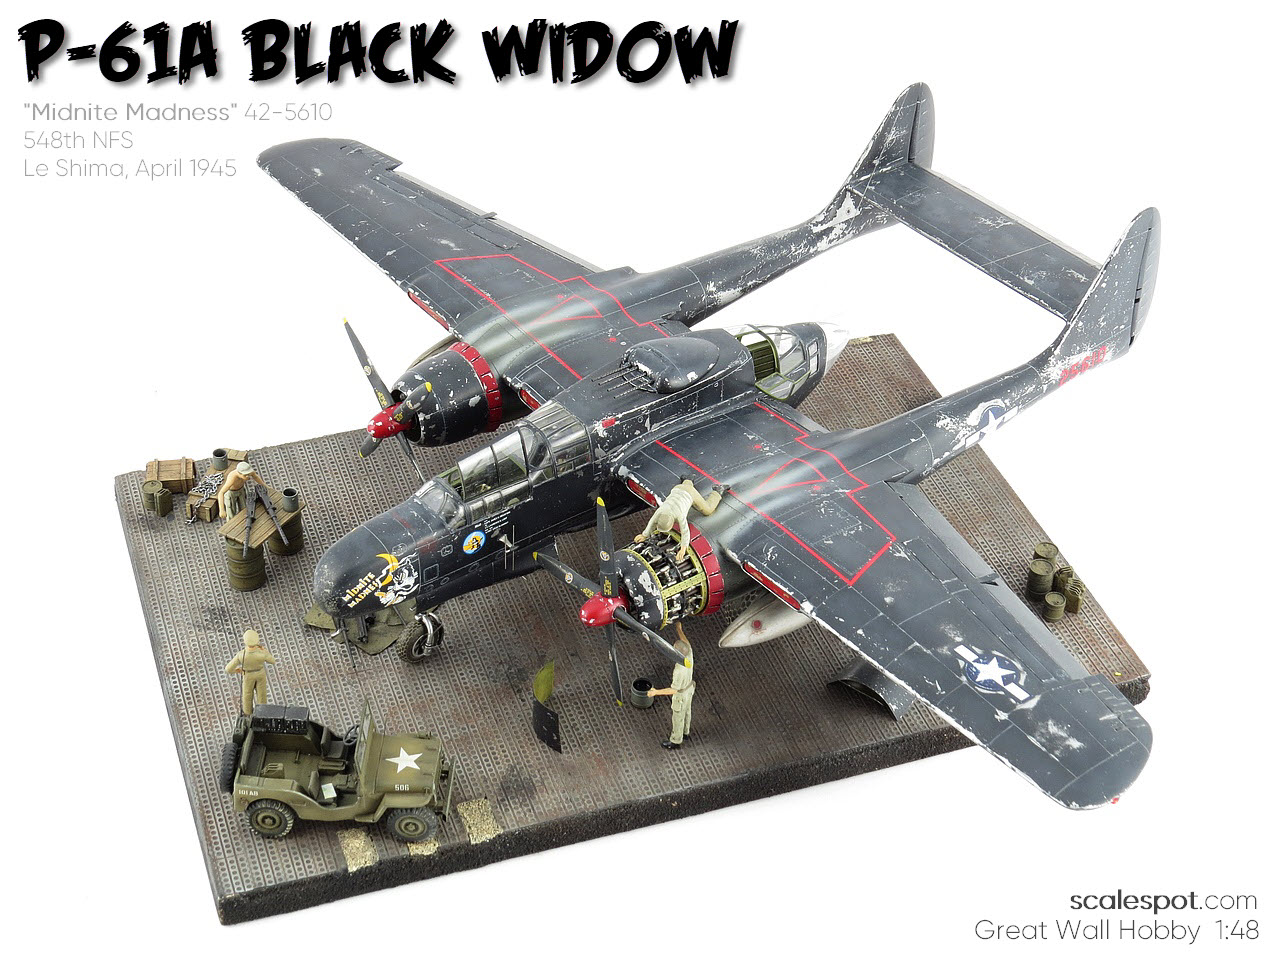 Jeep Covers scalespot.com - GWH 1/48 P-61A Black Widow